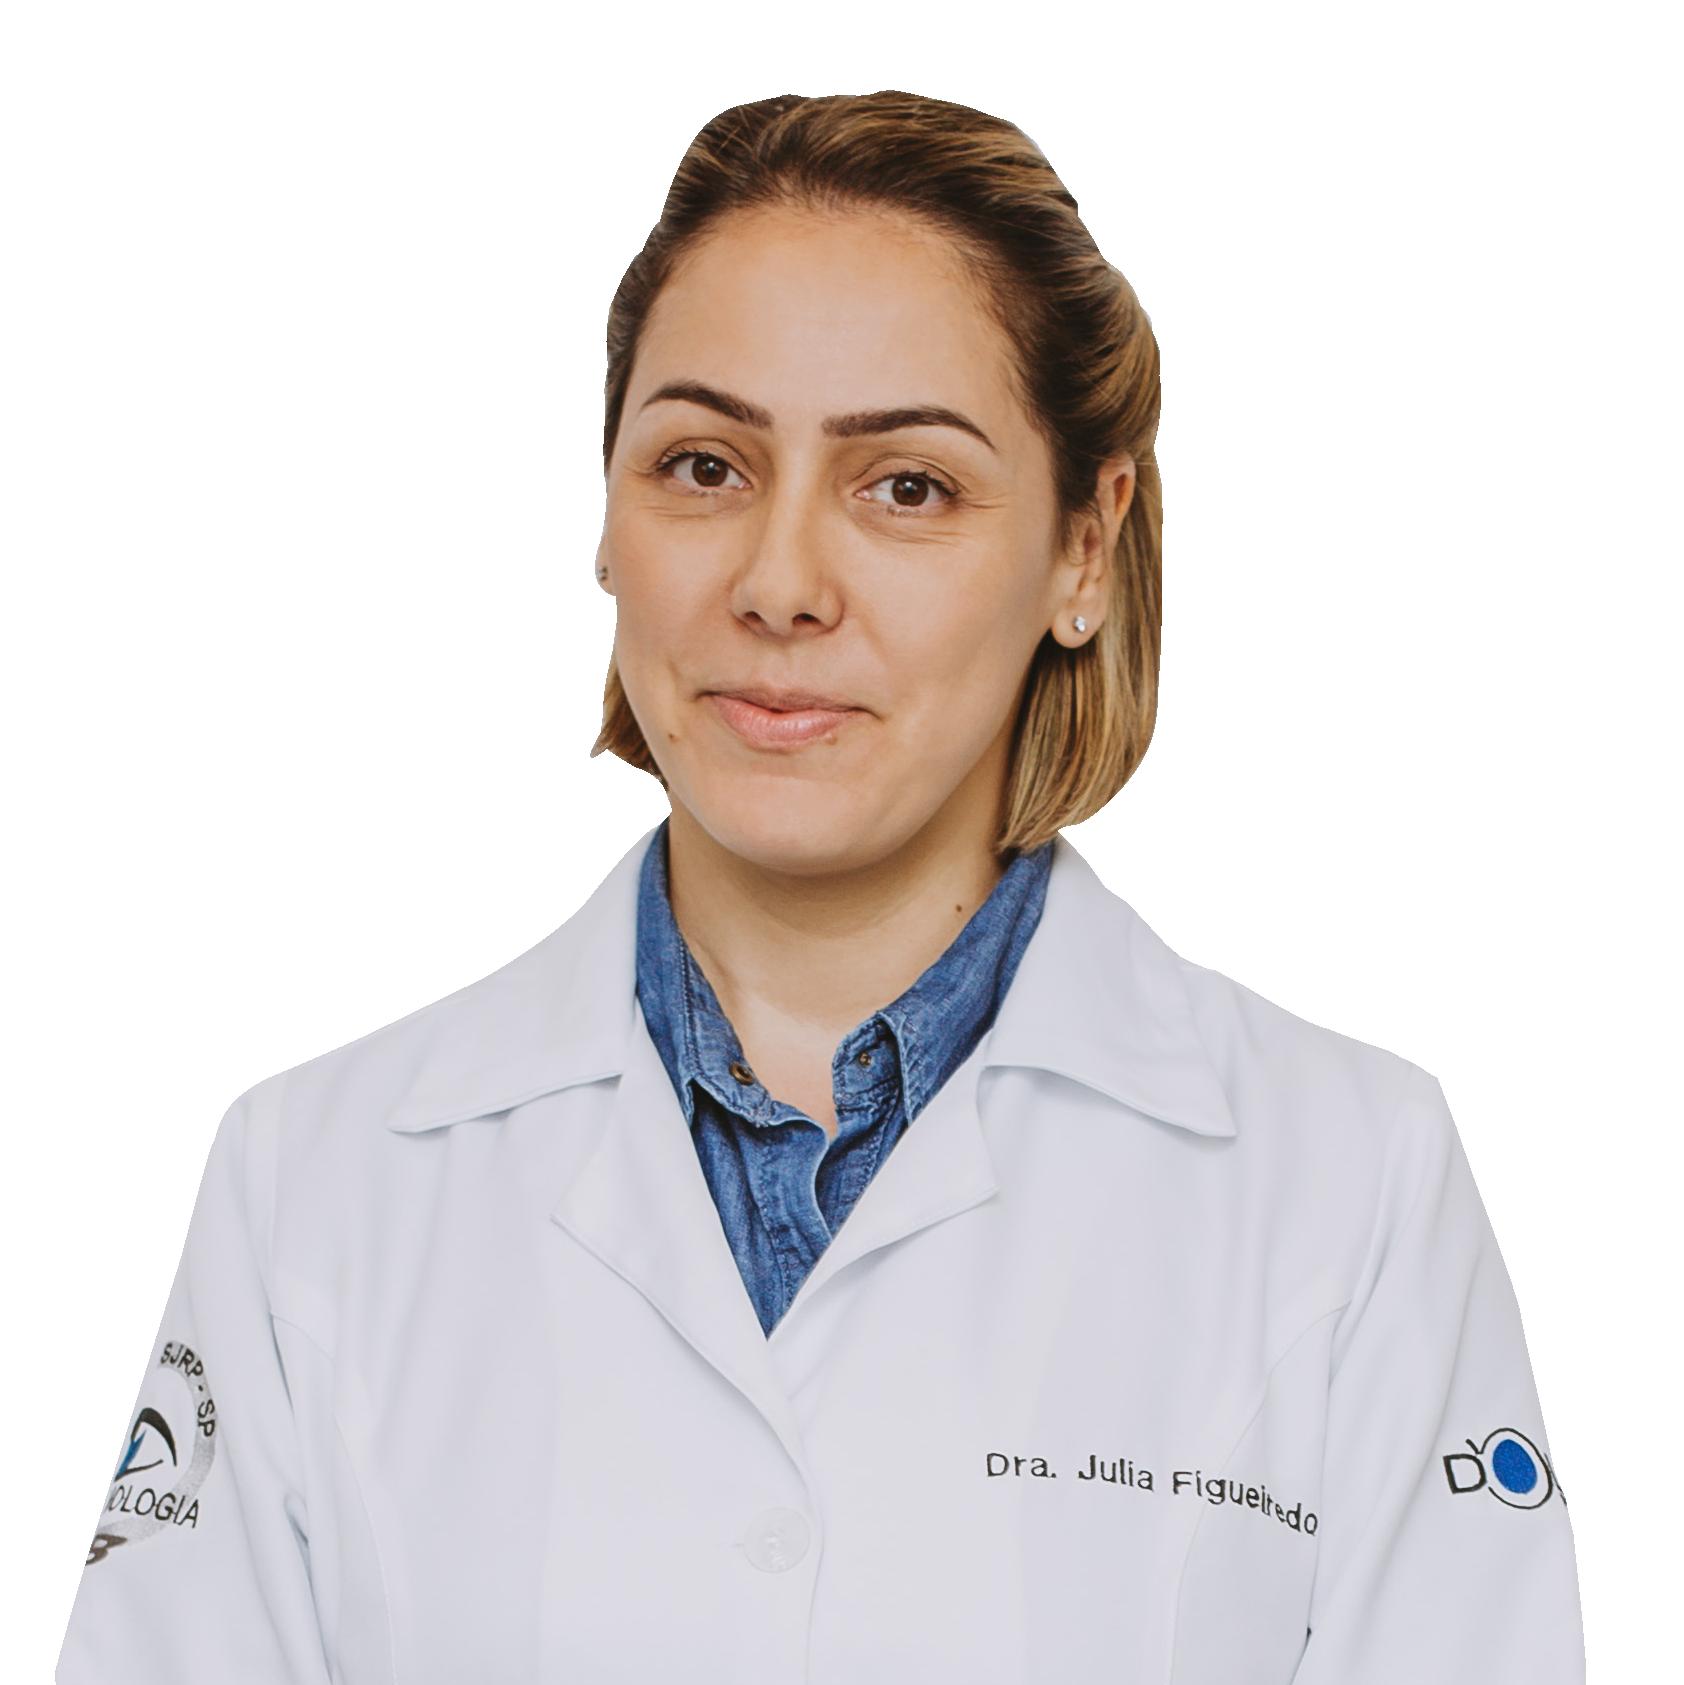 Dra. Julia Figueiredo - D'Olhos Hospital Dia